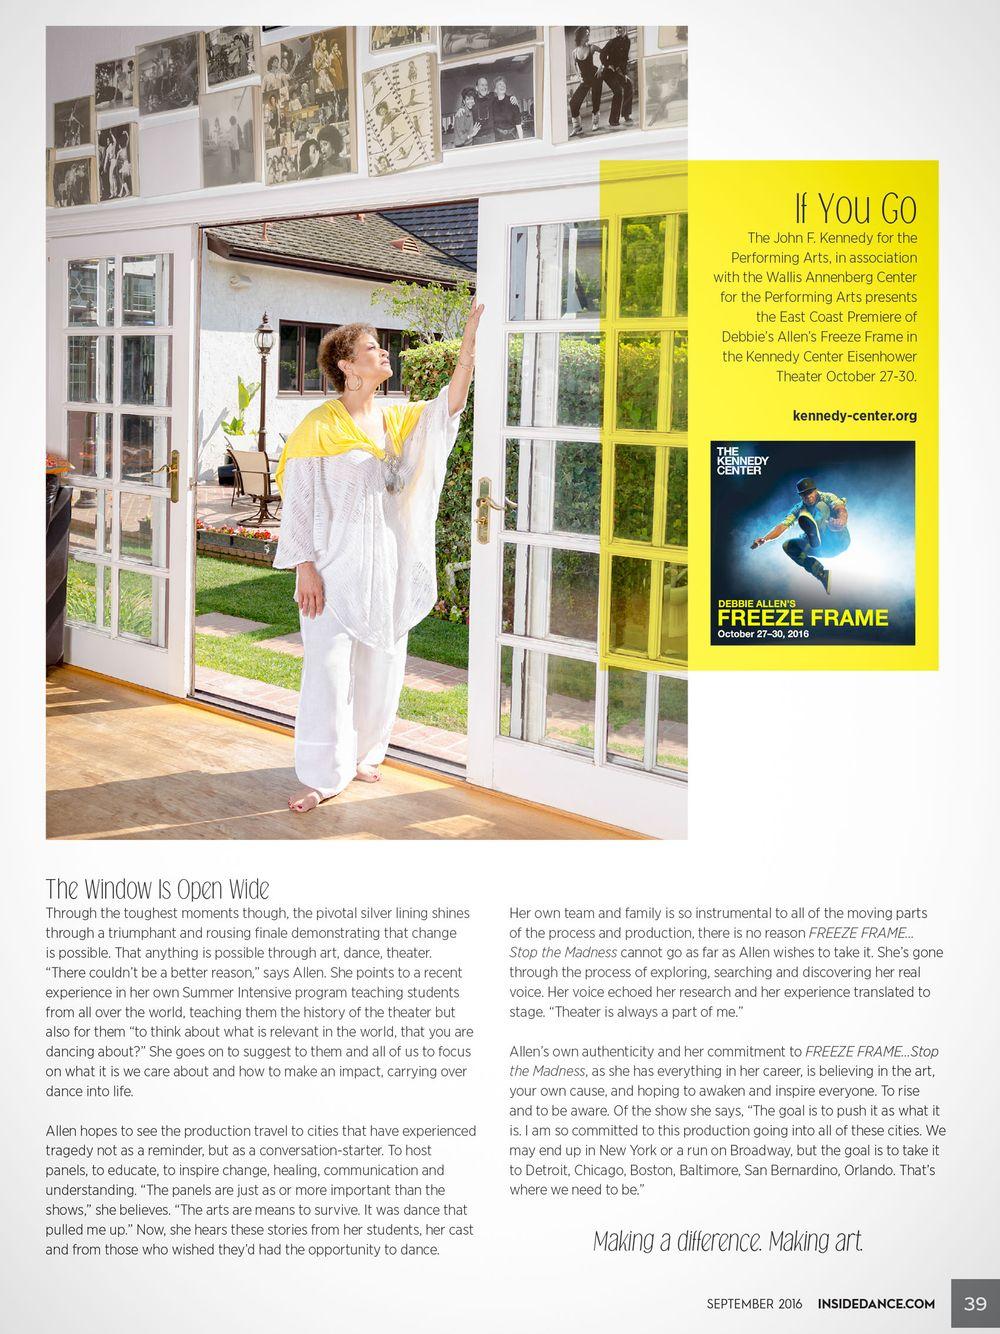 Debbie Allen photographed for Inside Dance Magazine